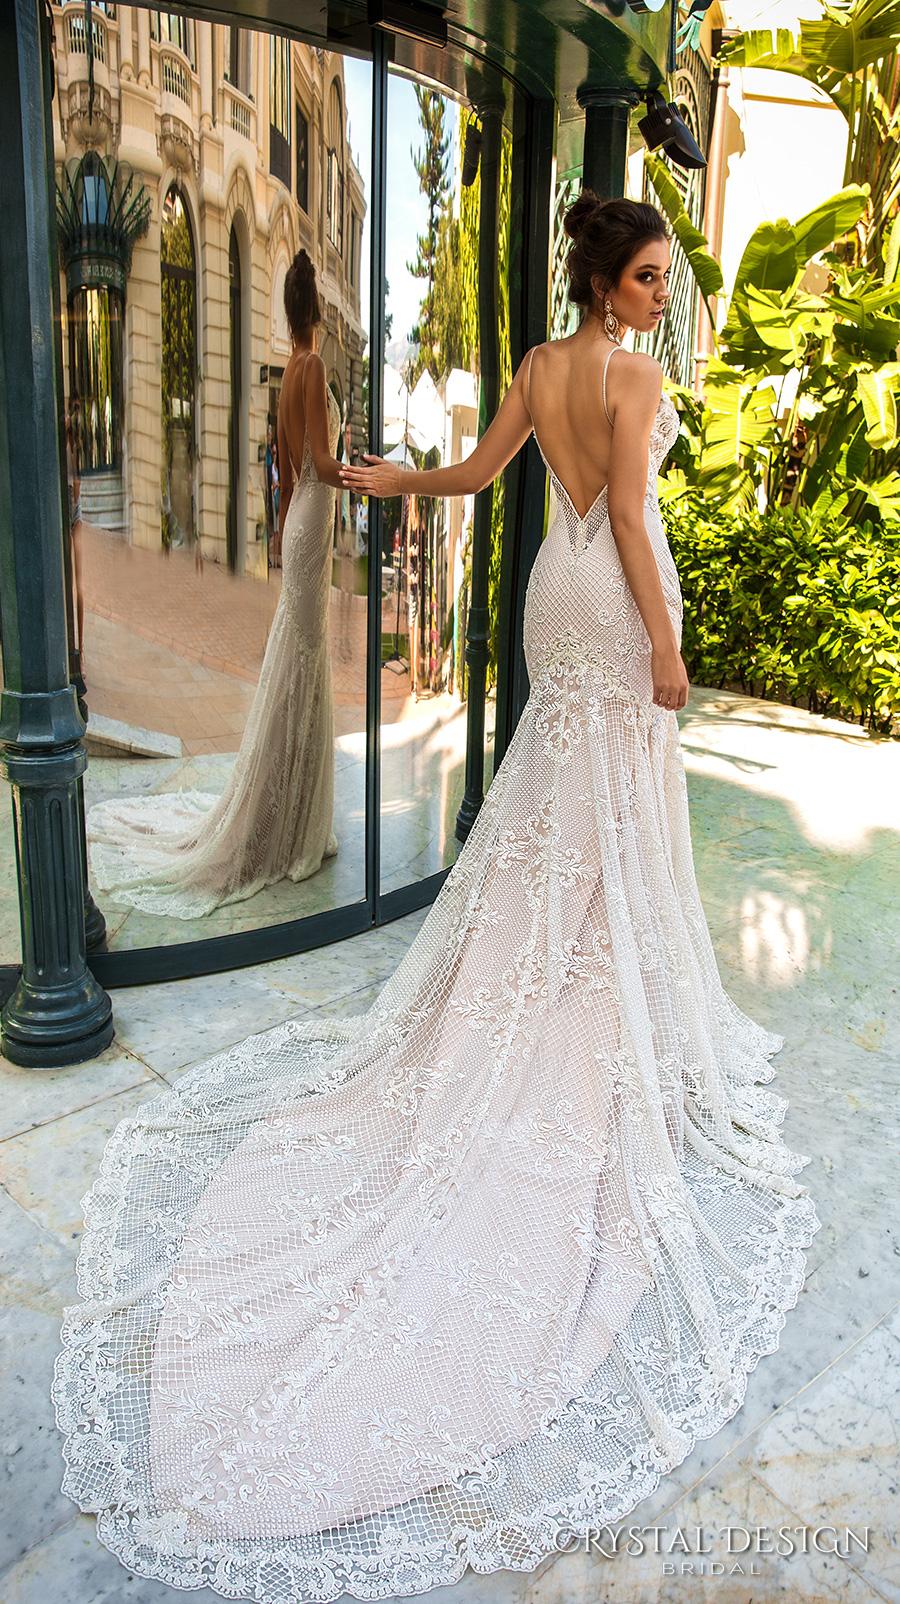 crystal design 2017 bridal sleeveless spagetti strap deep plunging v neck full embellishment elegant sexy fit and flare wedding dress low back chapel train (11 fler) bv